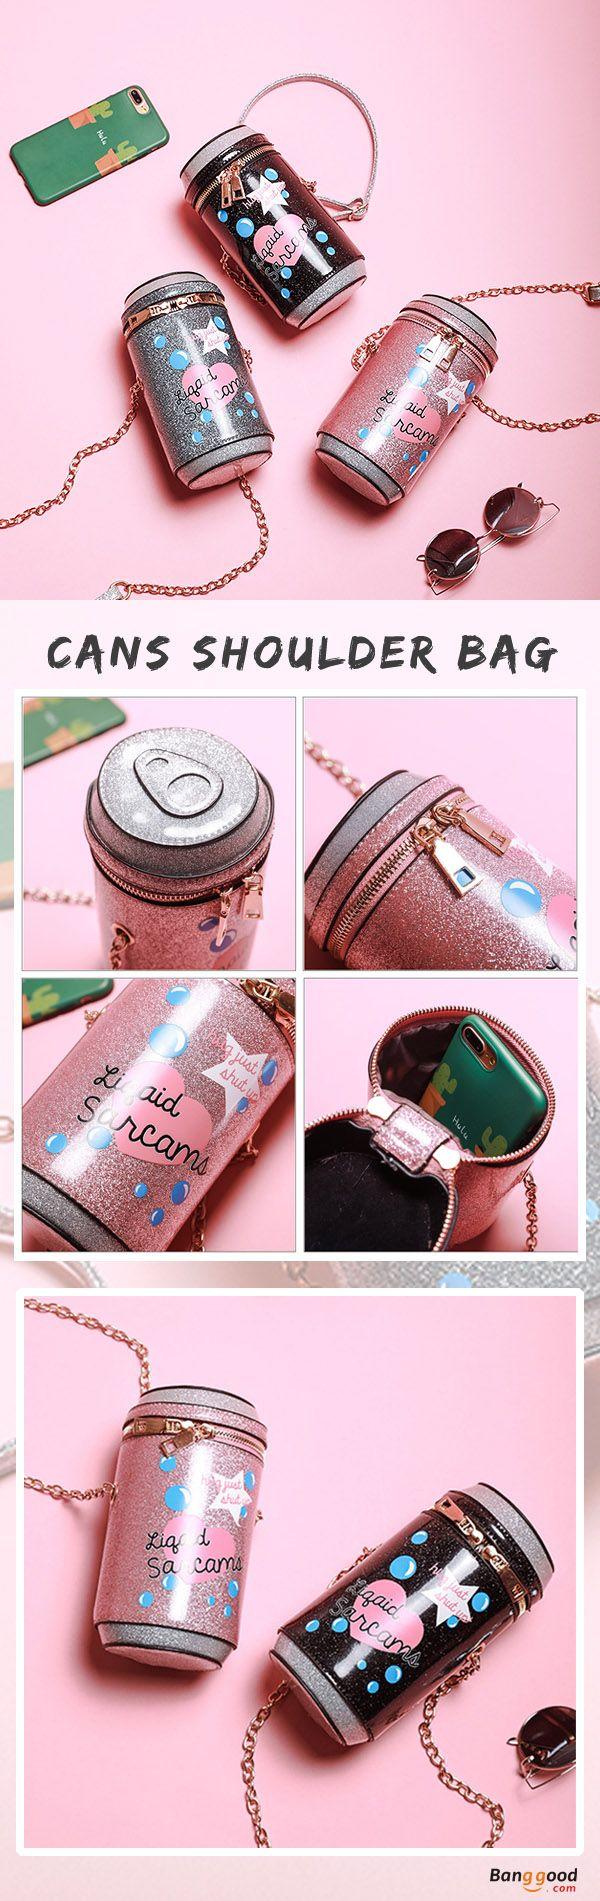 US$24.99+Free shipping. 50%OFF. Women Bags, Crossbody Bag, Shoulder Bag, Color: Gray, Black, Pink. Cans Design, Unique Bag for you! Shop now~